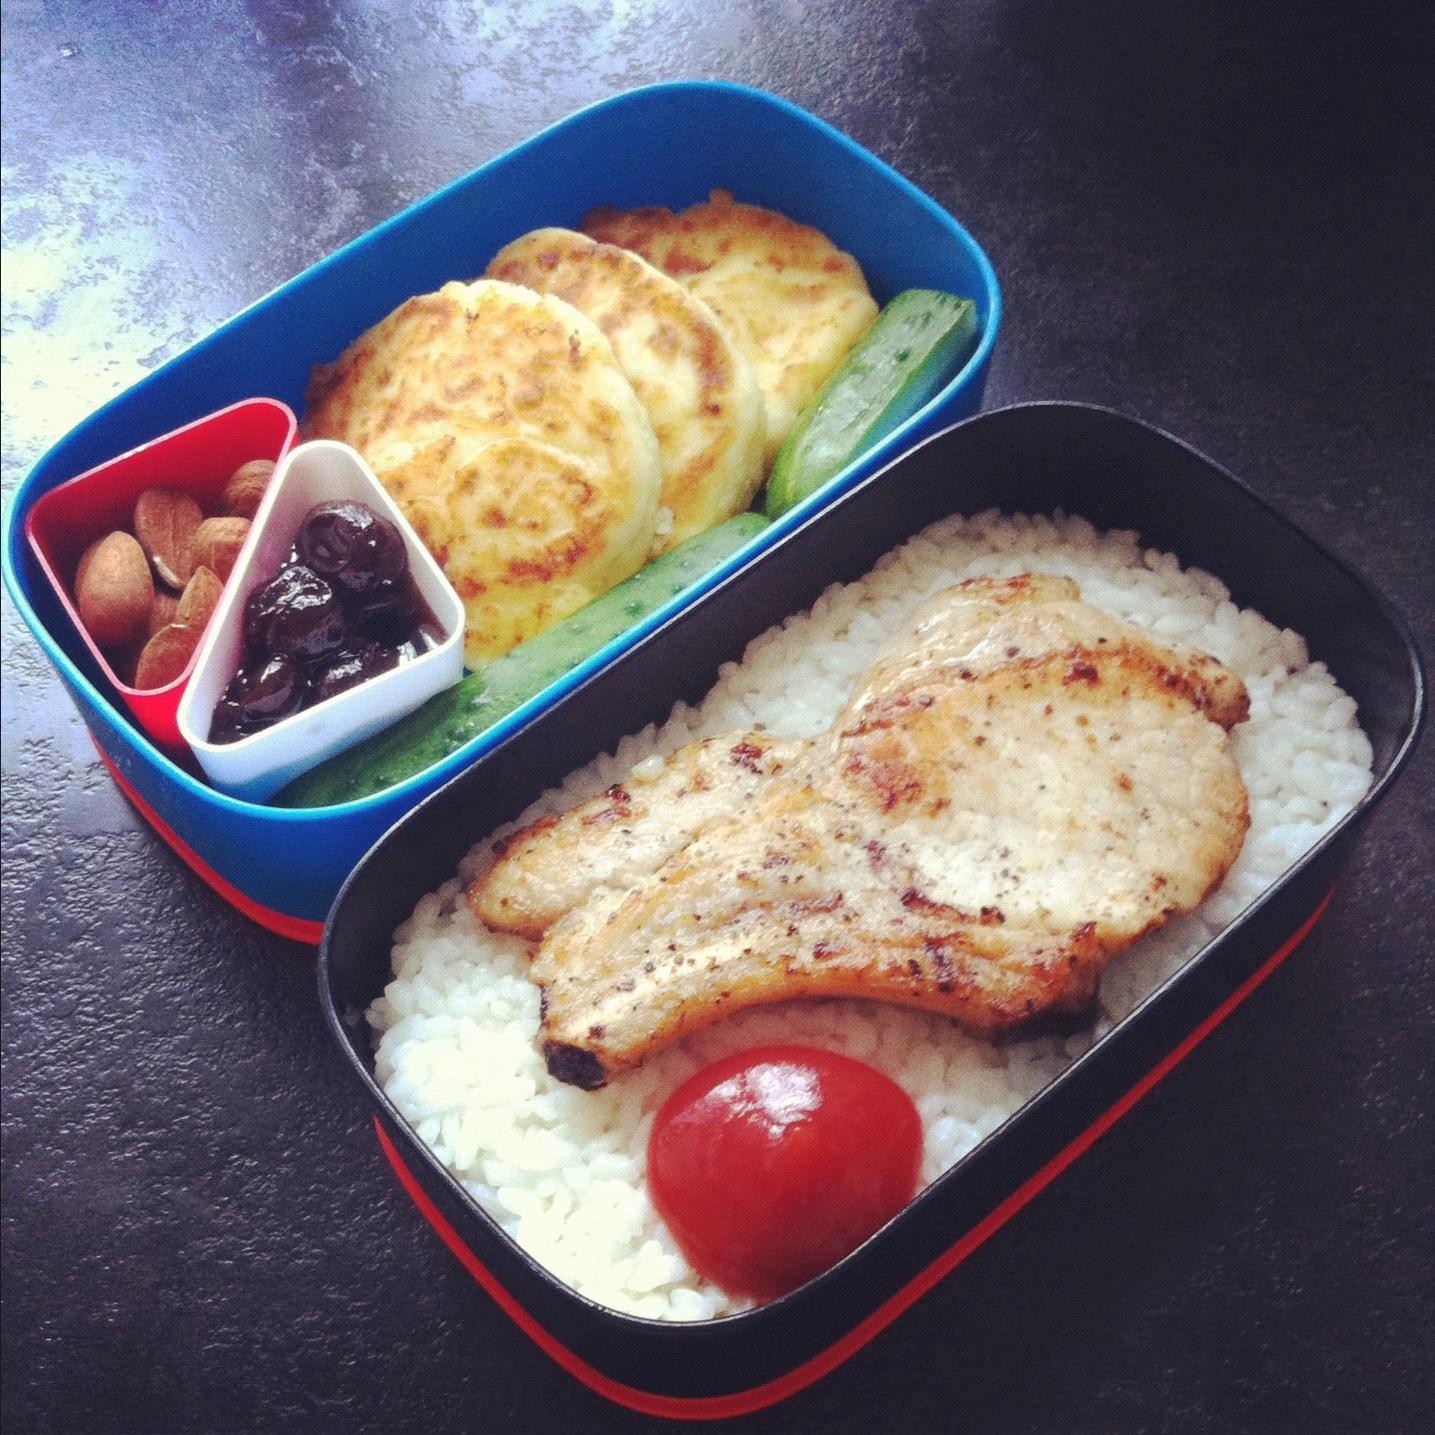 Рецепт обеда бенто: рис, стейк, сырники